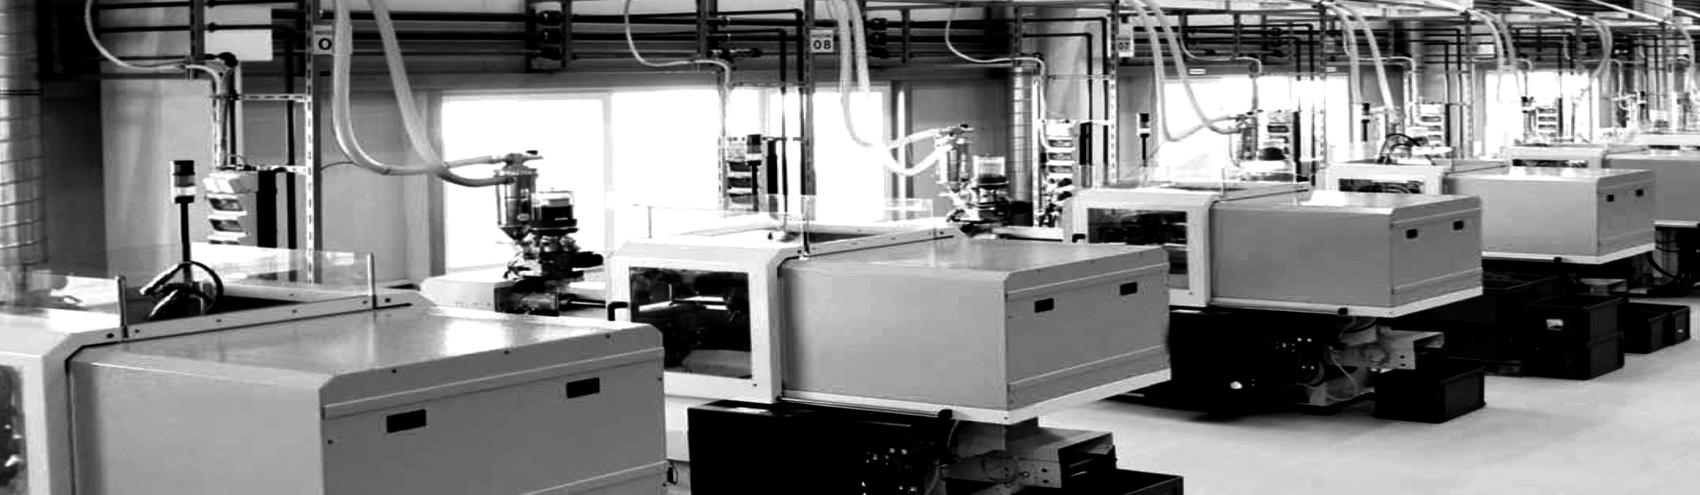 Citytron Machinery